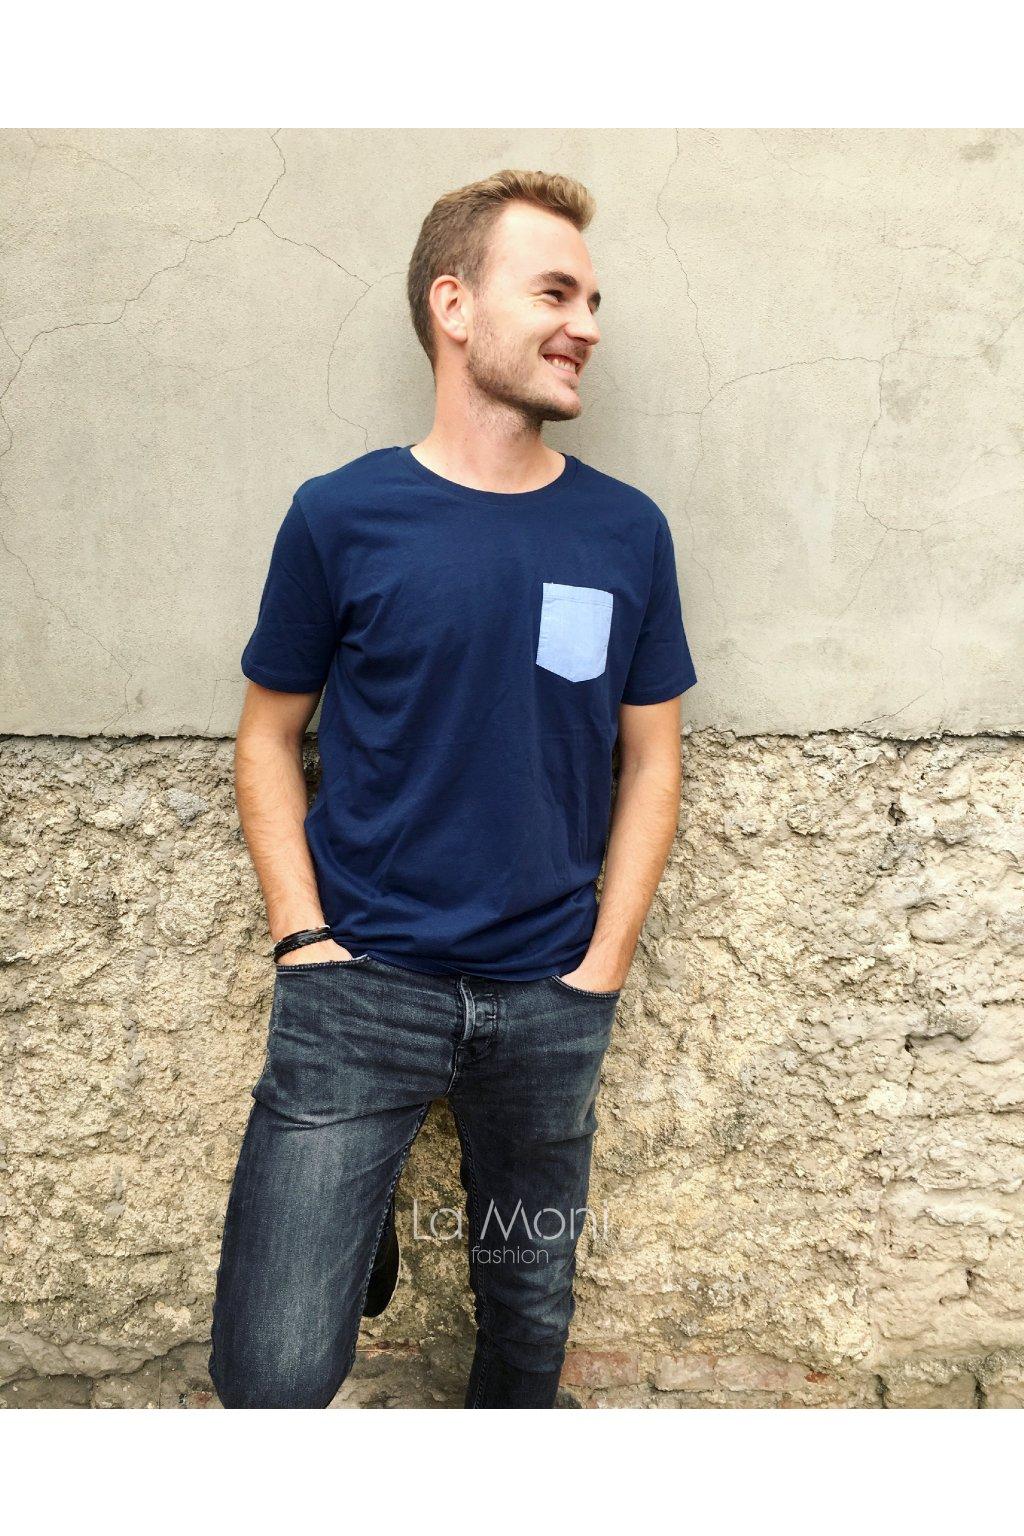 Pánské triko s kapsou